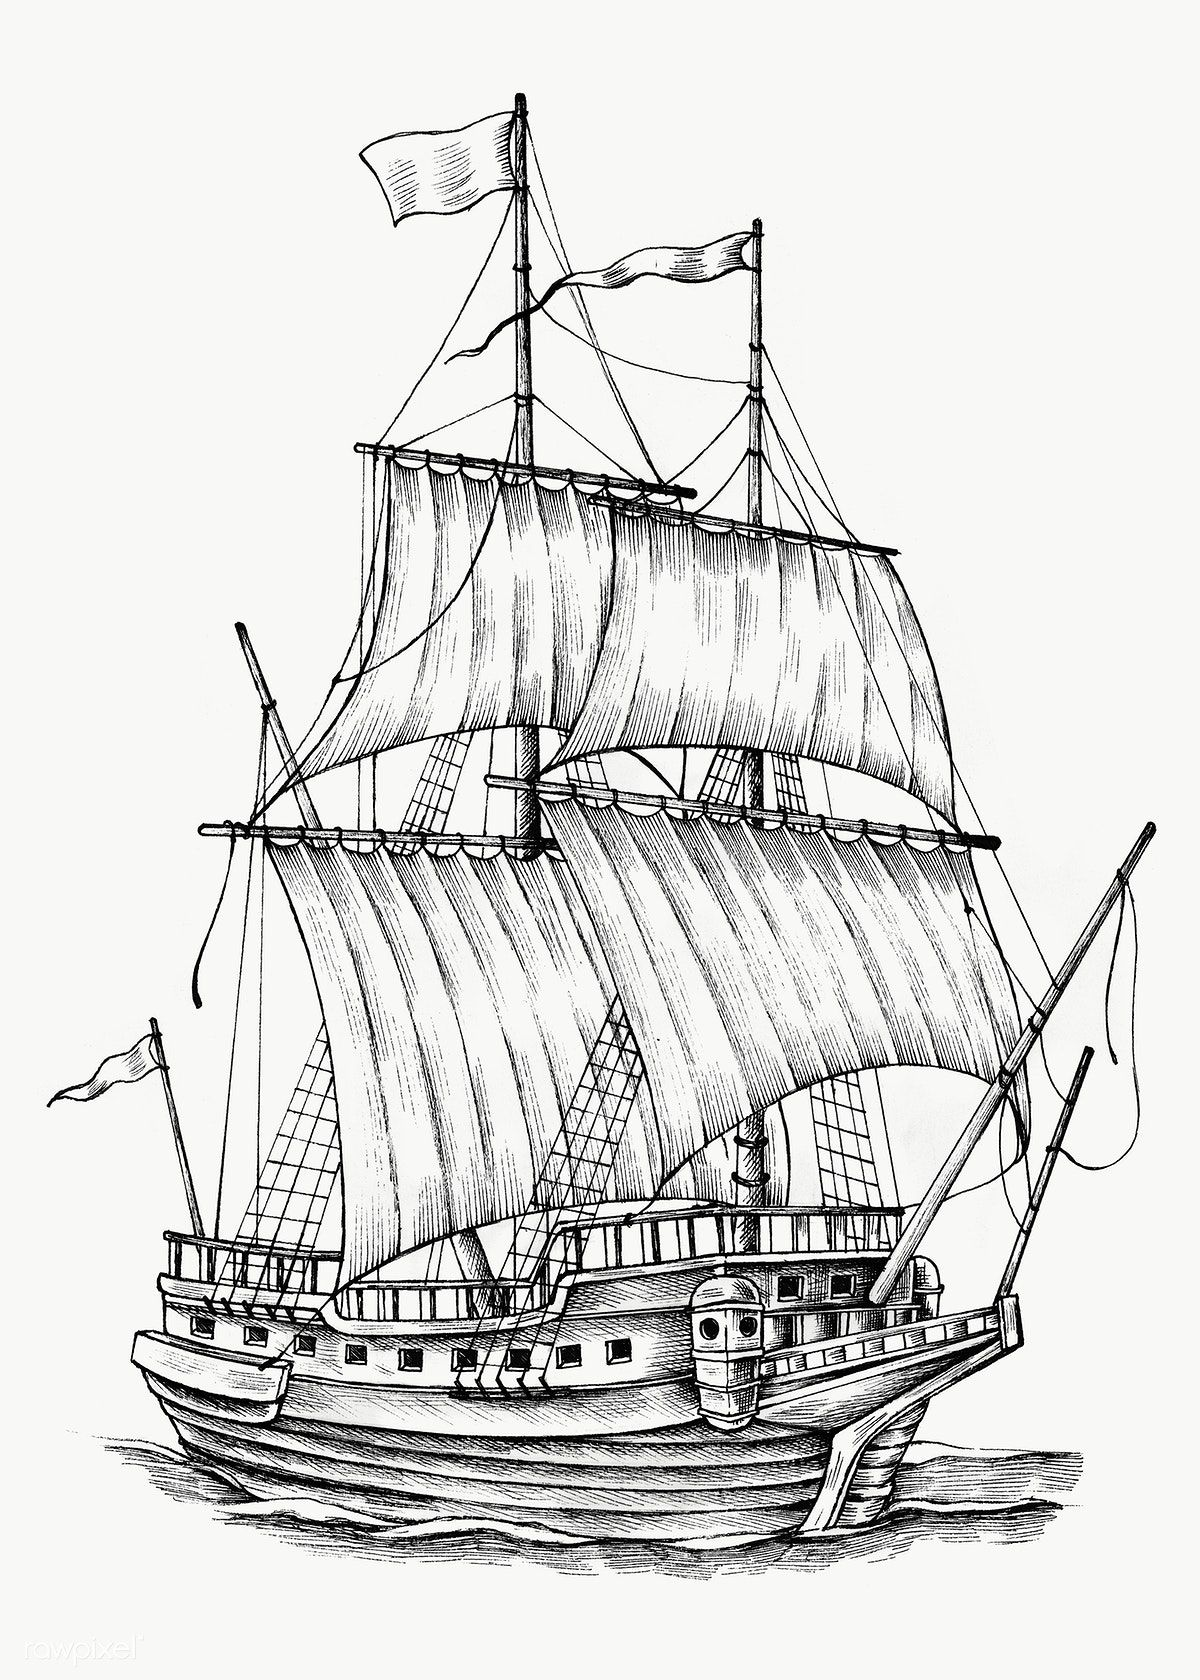 Hand Drawn Sailing Boat Transparent Png Free Image By Rawpixel Com Noon Vector Vectorart D How To Draw Hands Boat Illustration Sailing Boat Illustration